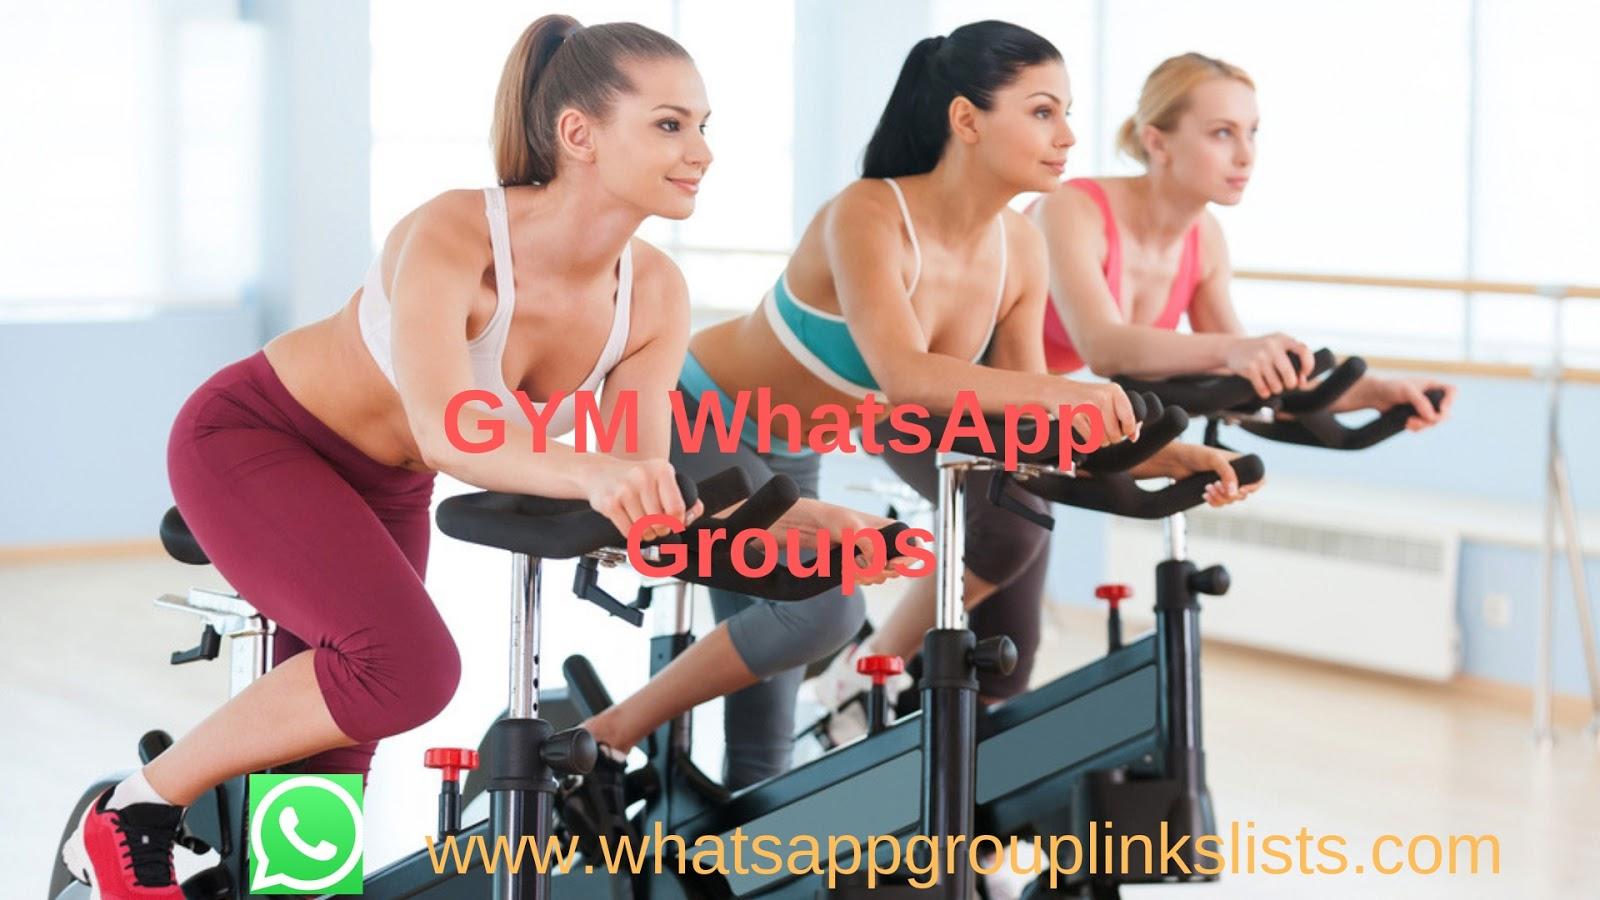 Join Gym WhatsApp Group Links List